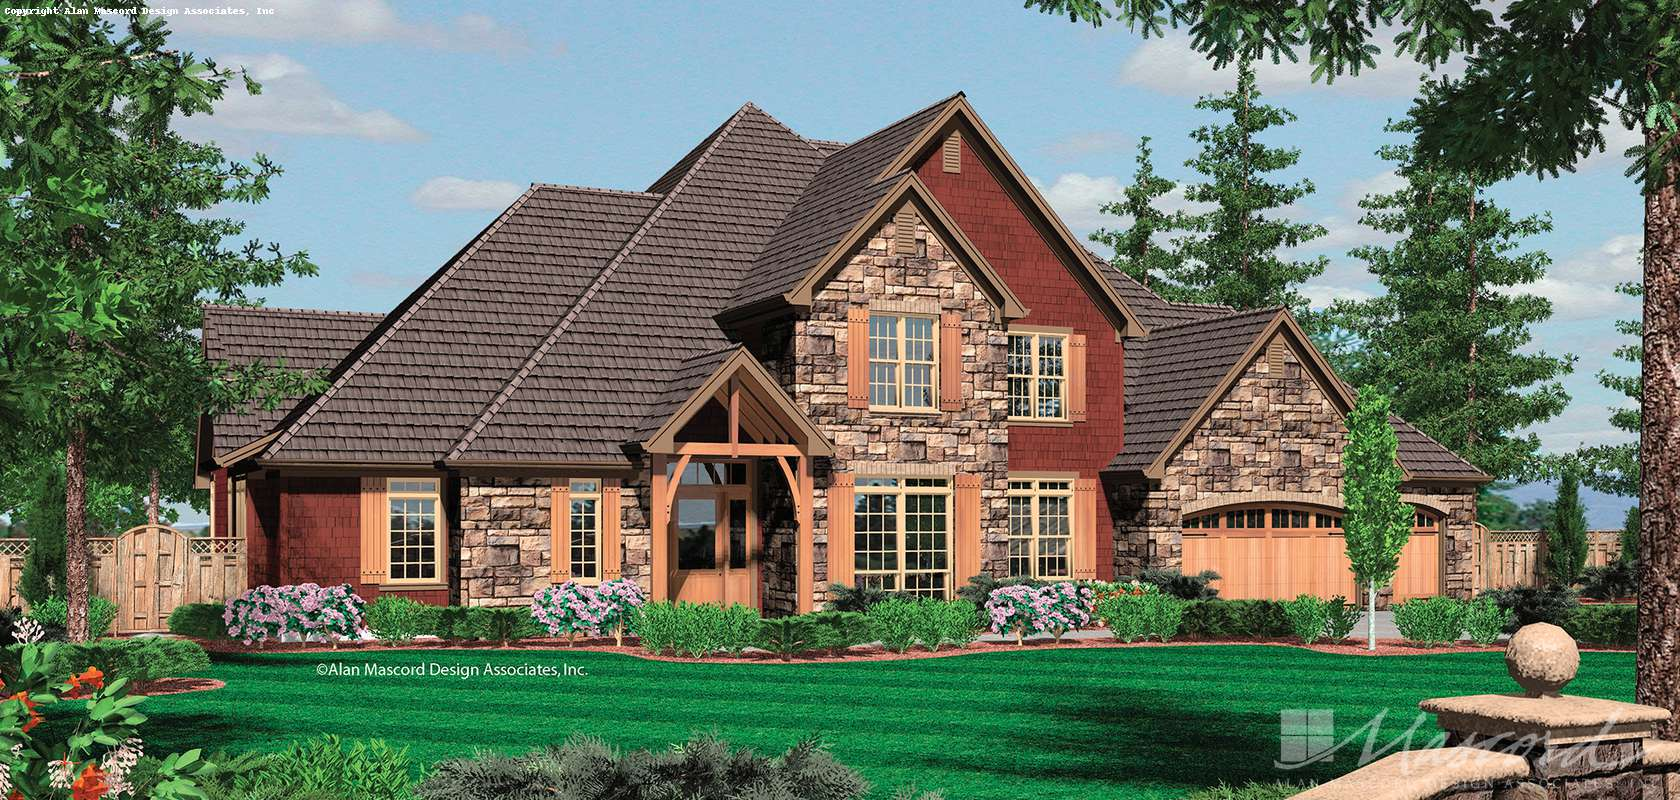 Mascord House Plan 2434: The Ellisville